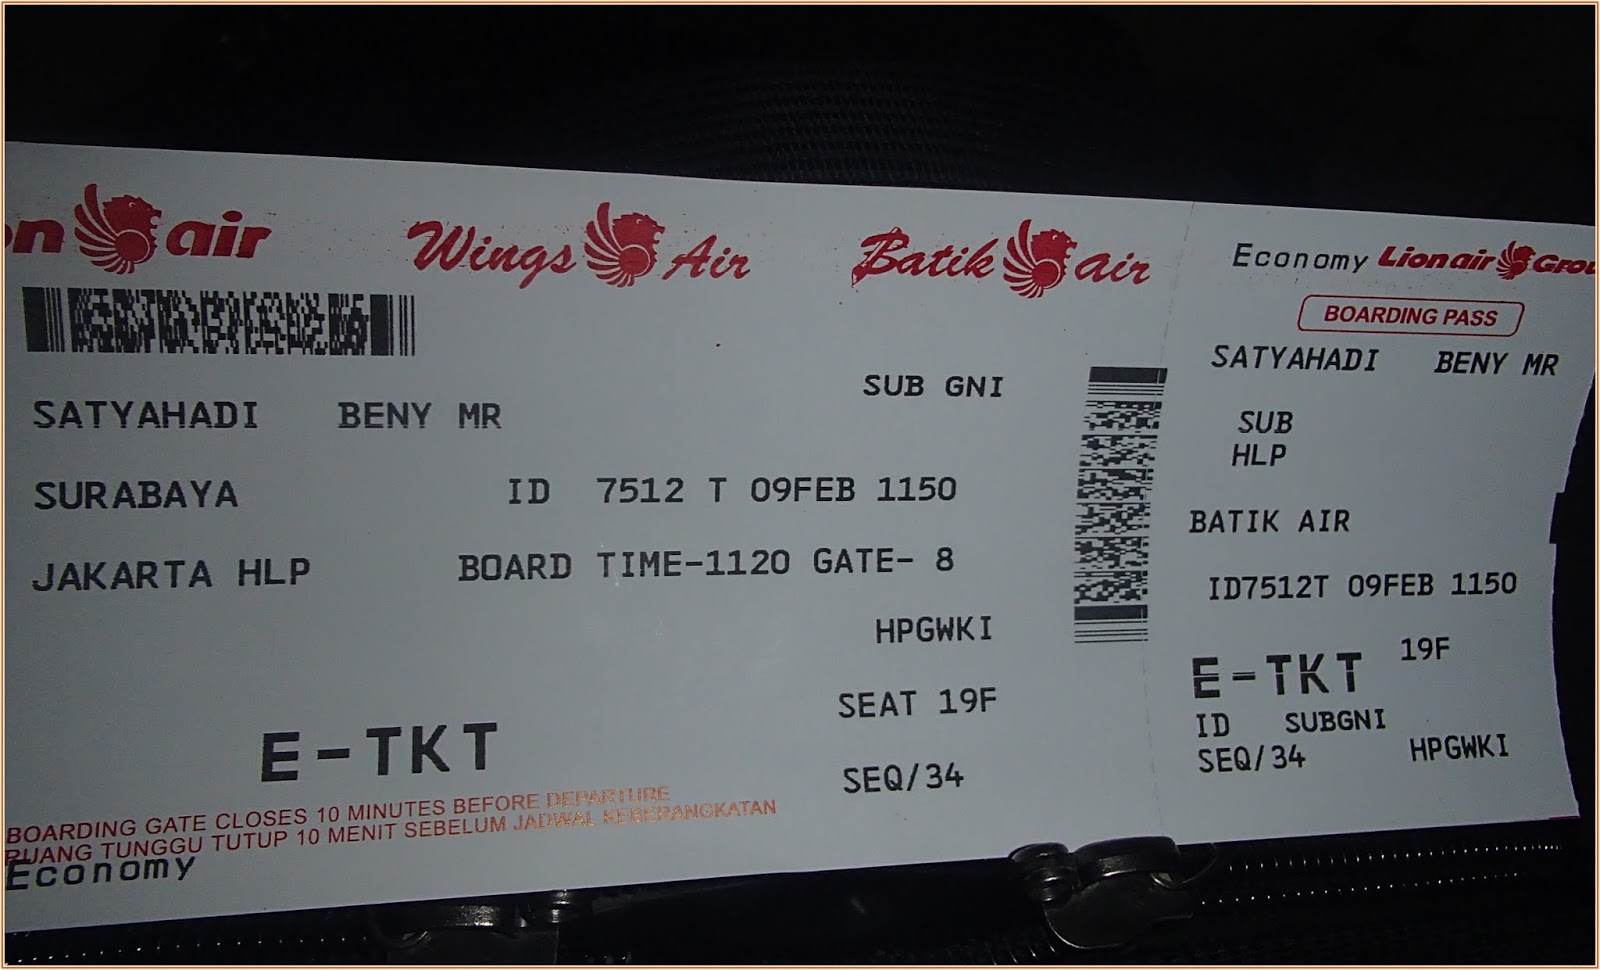 the satyahadi s journal terbang dengan batik air di airport halim rh benysatyahadi blogspot com tiket pesawat jakarta jogja dari halim Harga Tiket Pesawat